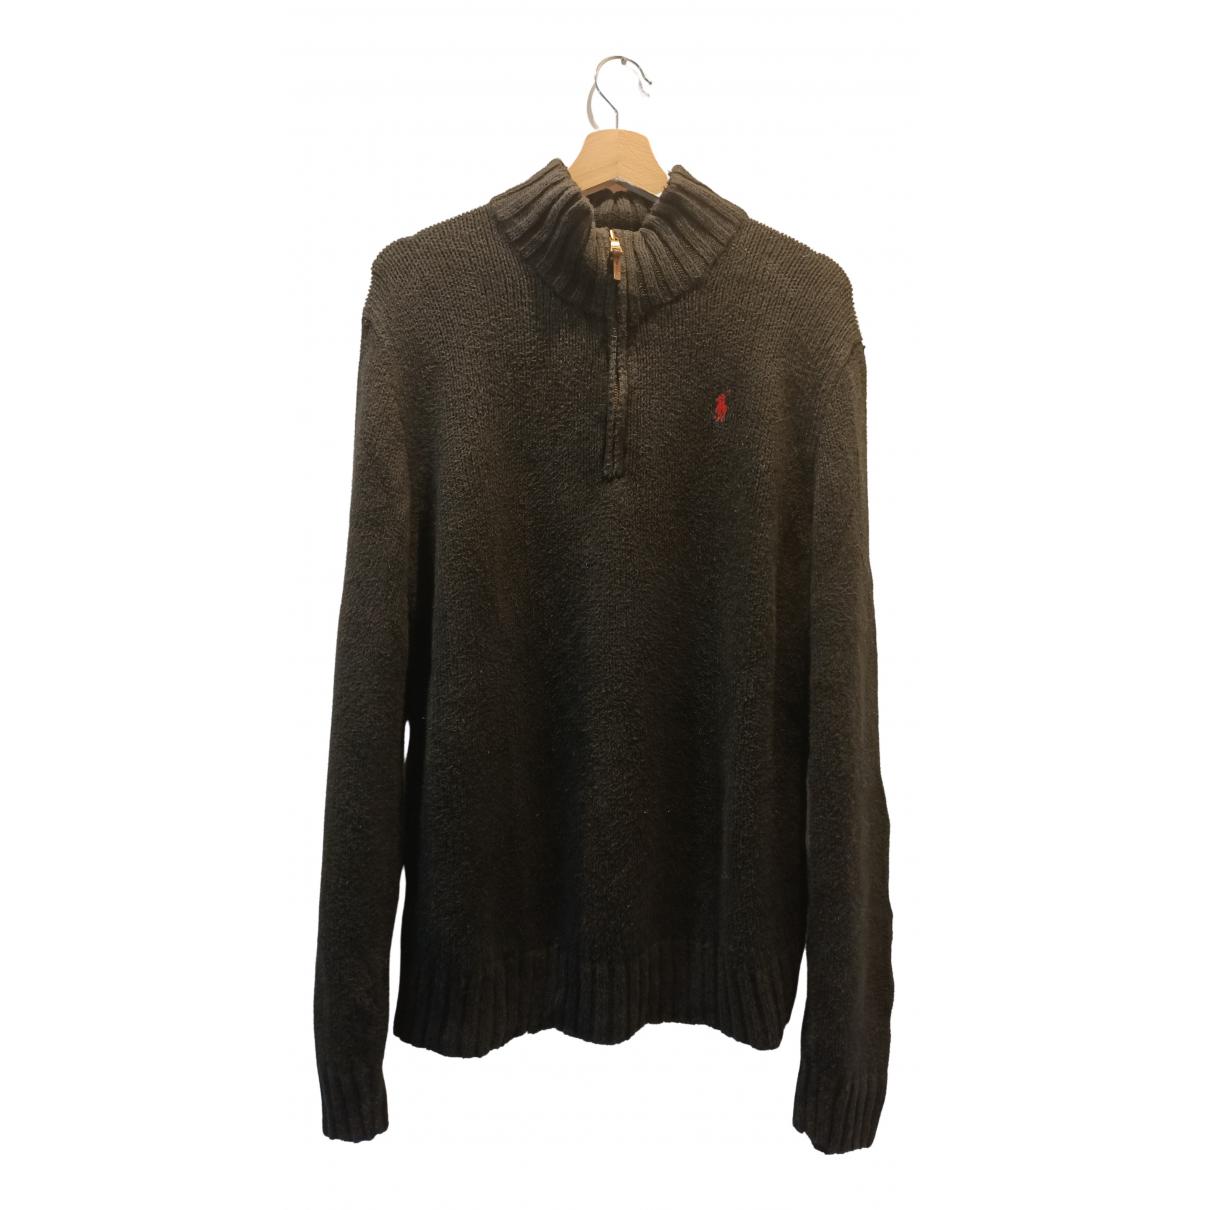 Polo Ralph Lauren N Black Cotton Knitwear & Sweatshirts for Men M International